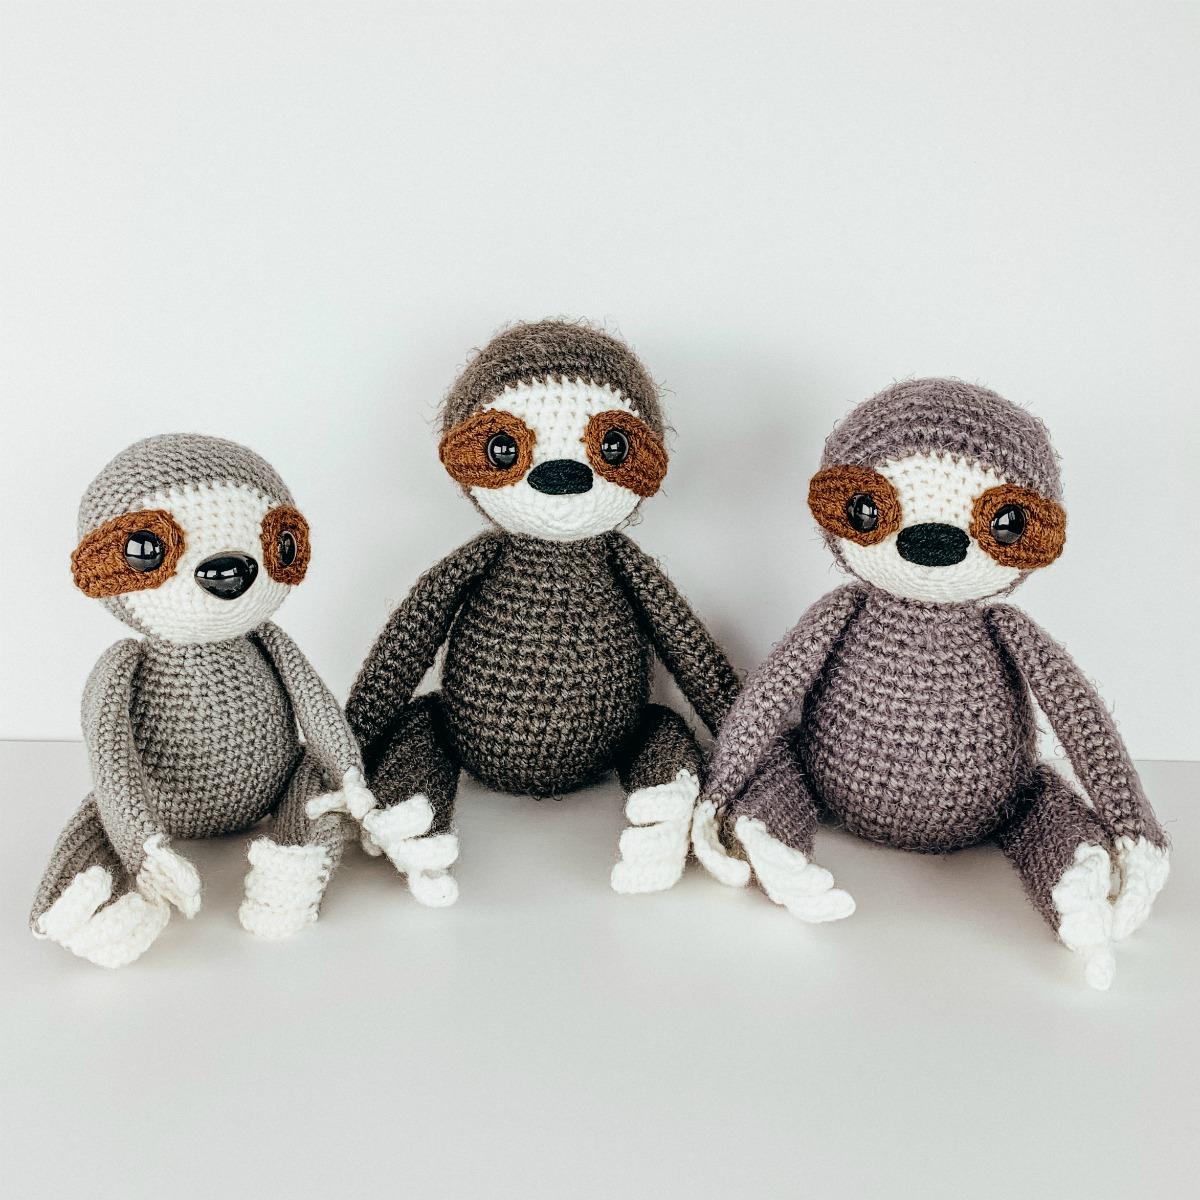 Sweet Softies | Amigurumi and Crochet: Loving Bride and Groom Wedding Dolls  | Crochet dolls free patterns, Crochet wedding gift, Wedding doll | 1200x1200